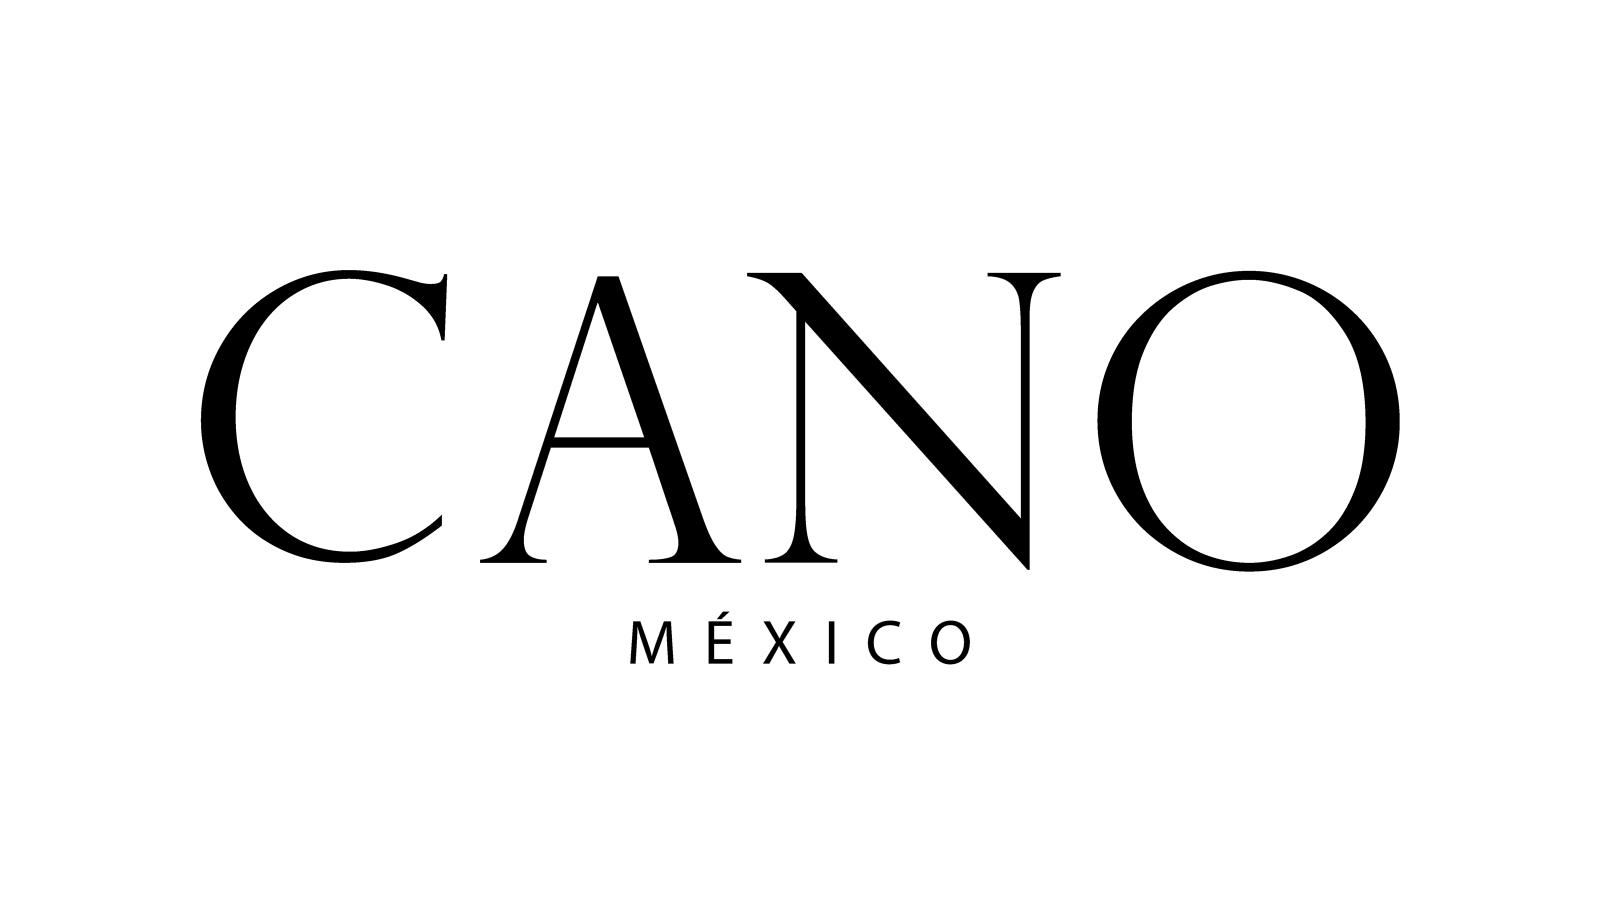 NEW.Cano-FINAL_vector_16-9_BLACK-600dpi.jpg